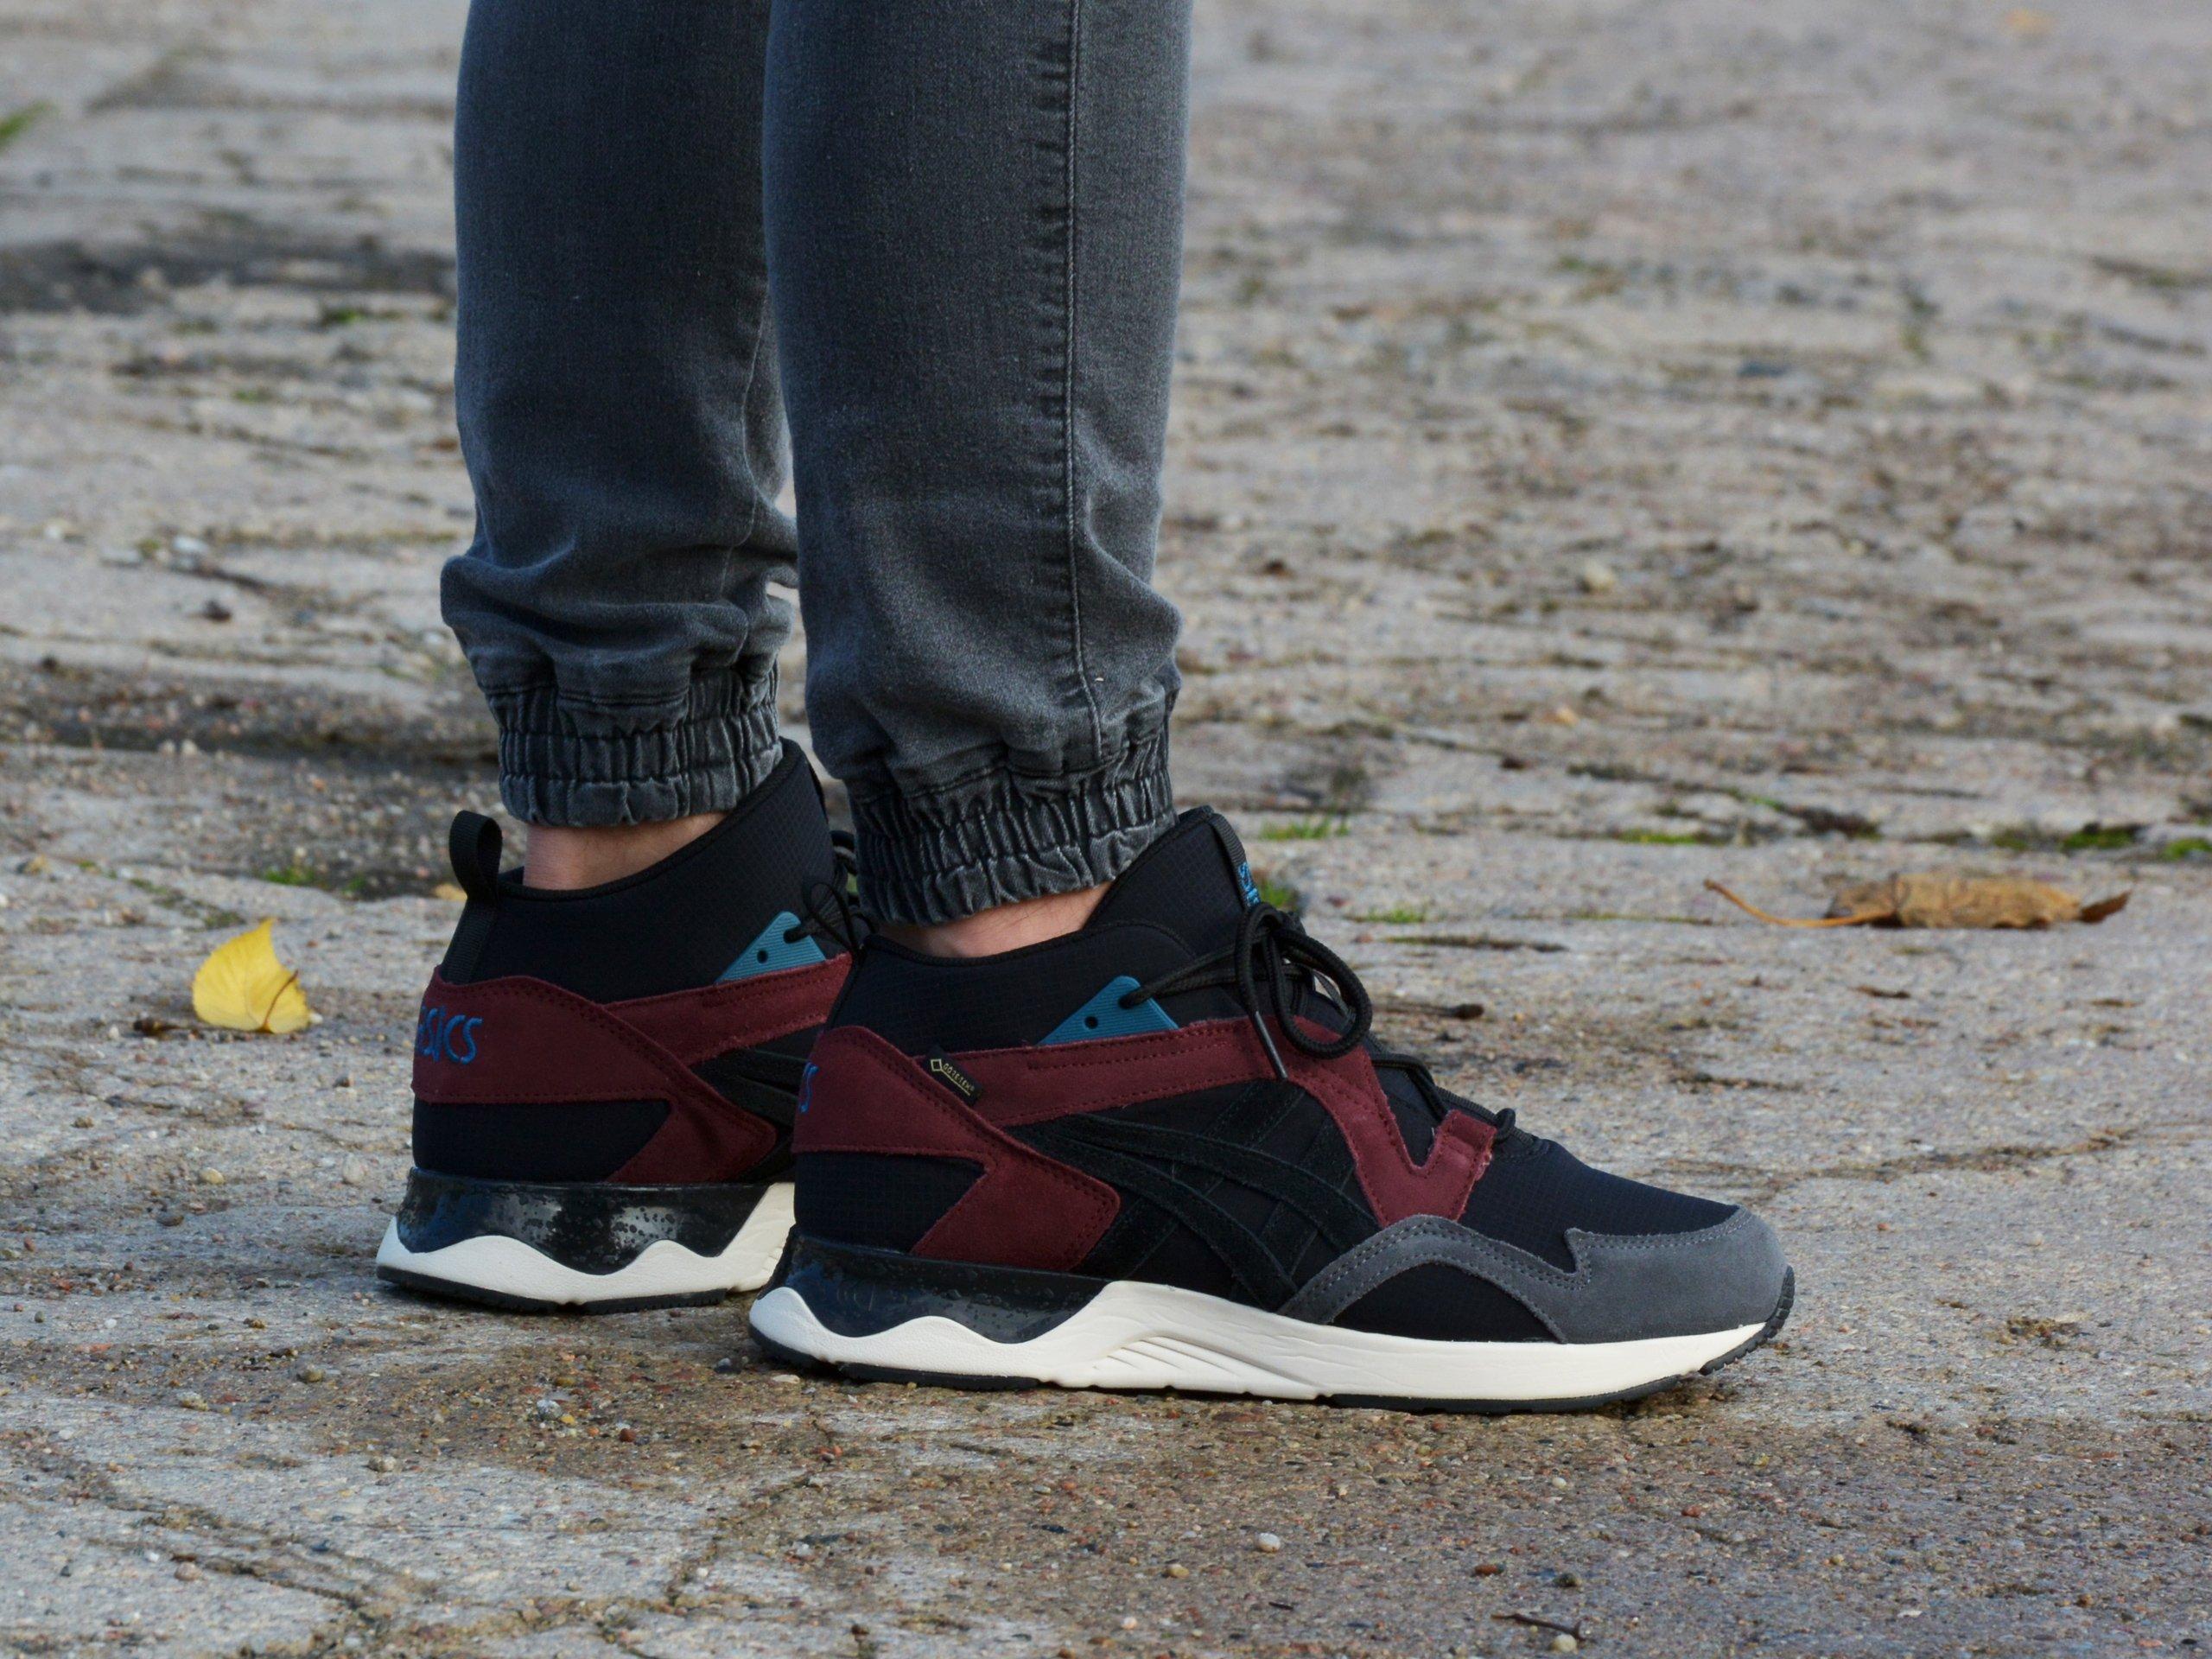 Asics - Gel-Lyte V Sanze Mt Gore Tex 1193A050-001 - Sneakers - Black / Burgundy